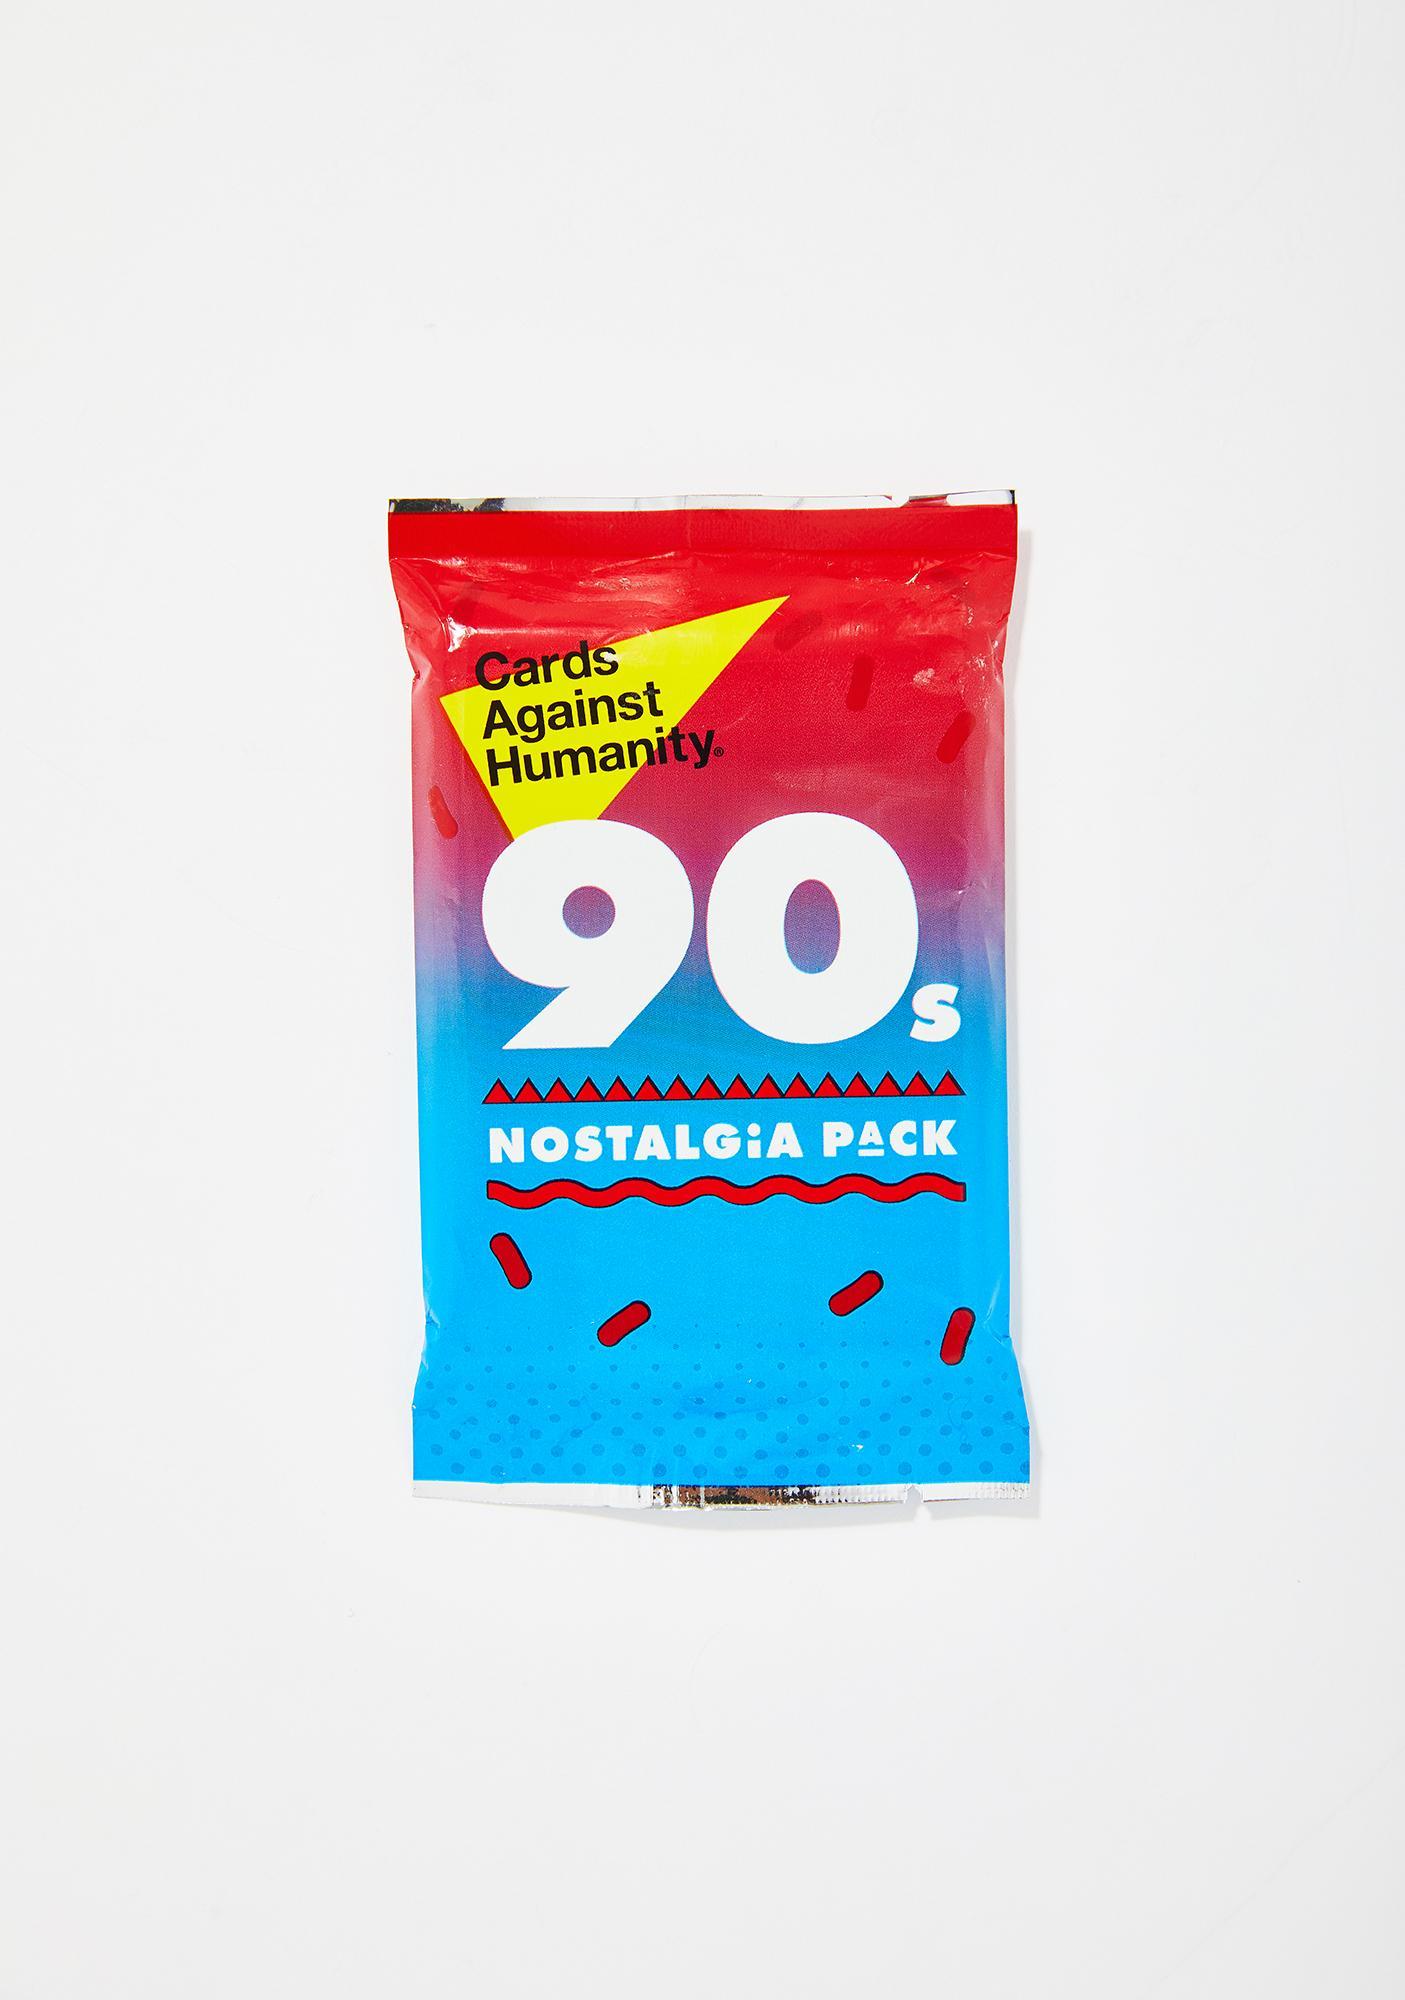 Holiday 90s Nostalgia Pack Expansion | Dolls Kill